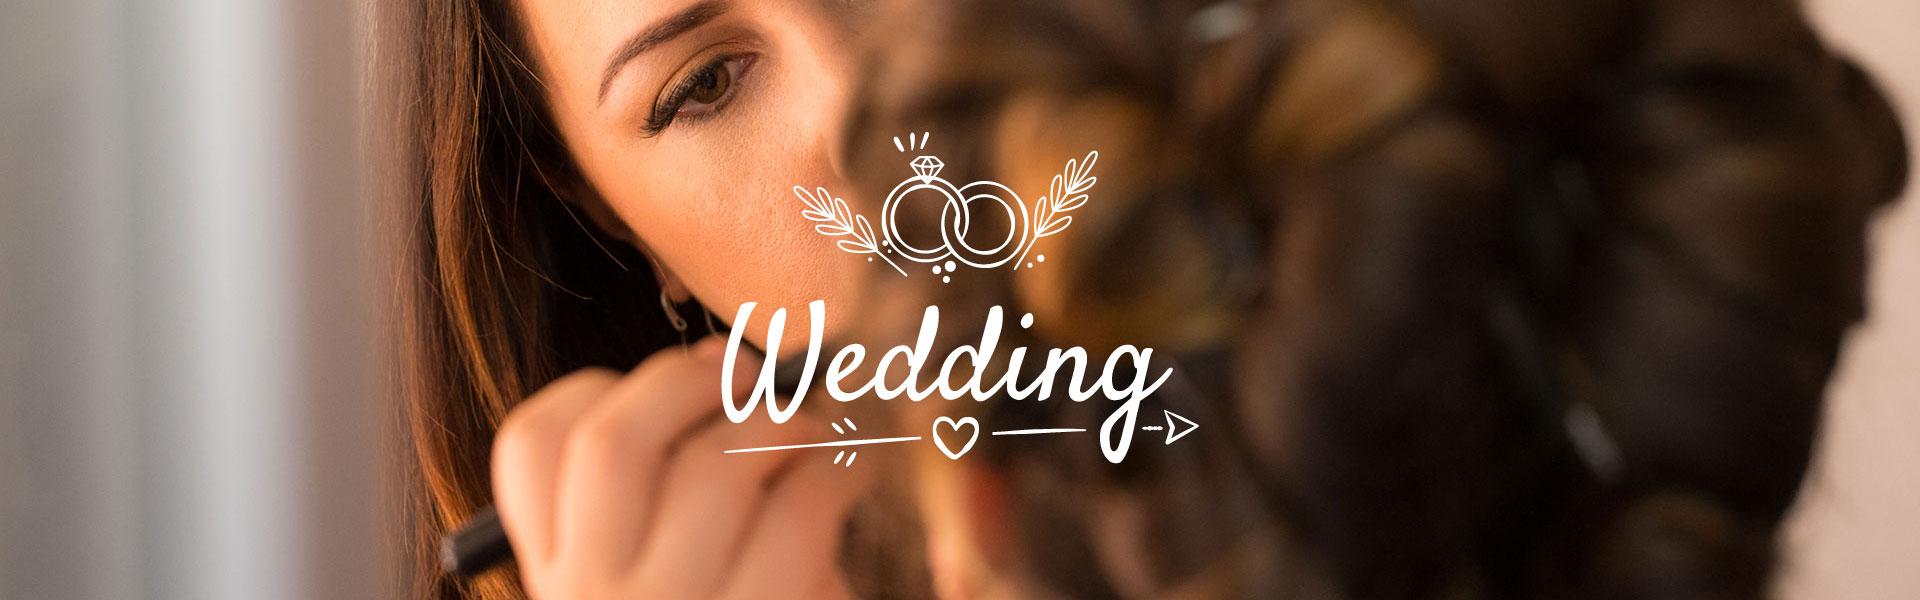 Maison Afrodite - Wedding - Video dedicati al trucco sposa!